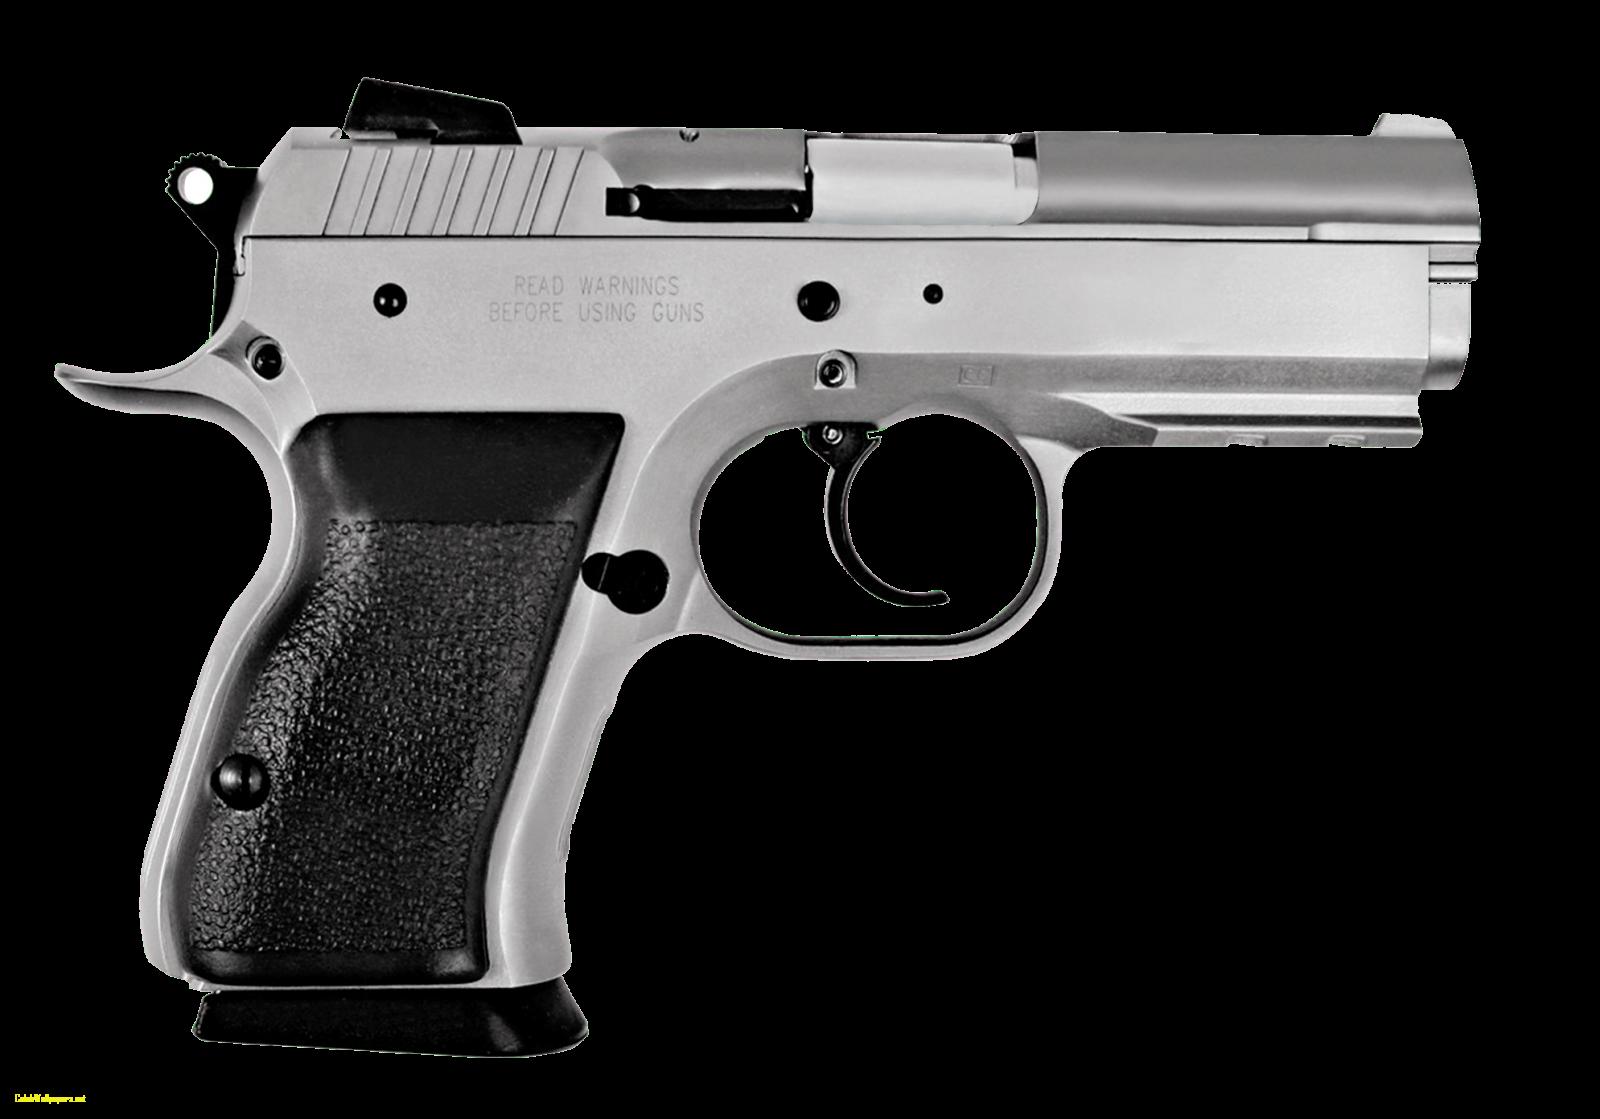 Images bullet glock revolver. Clipart gun gun violence